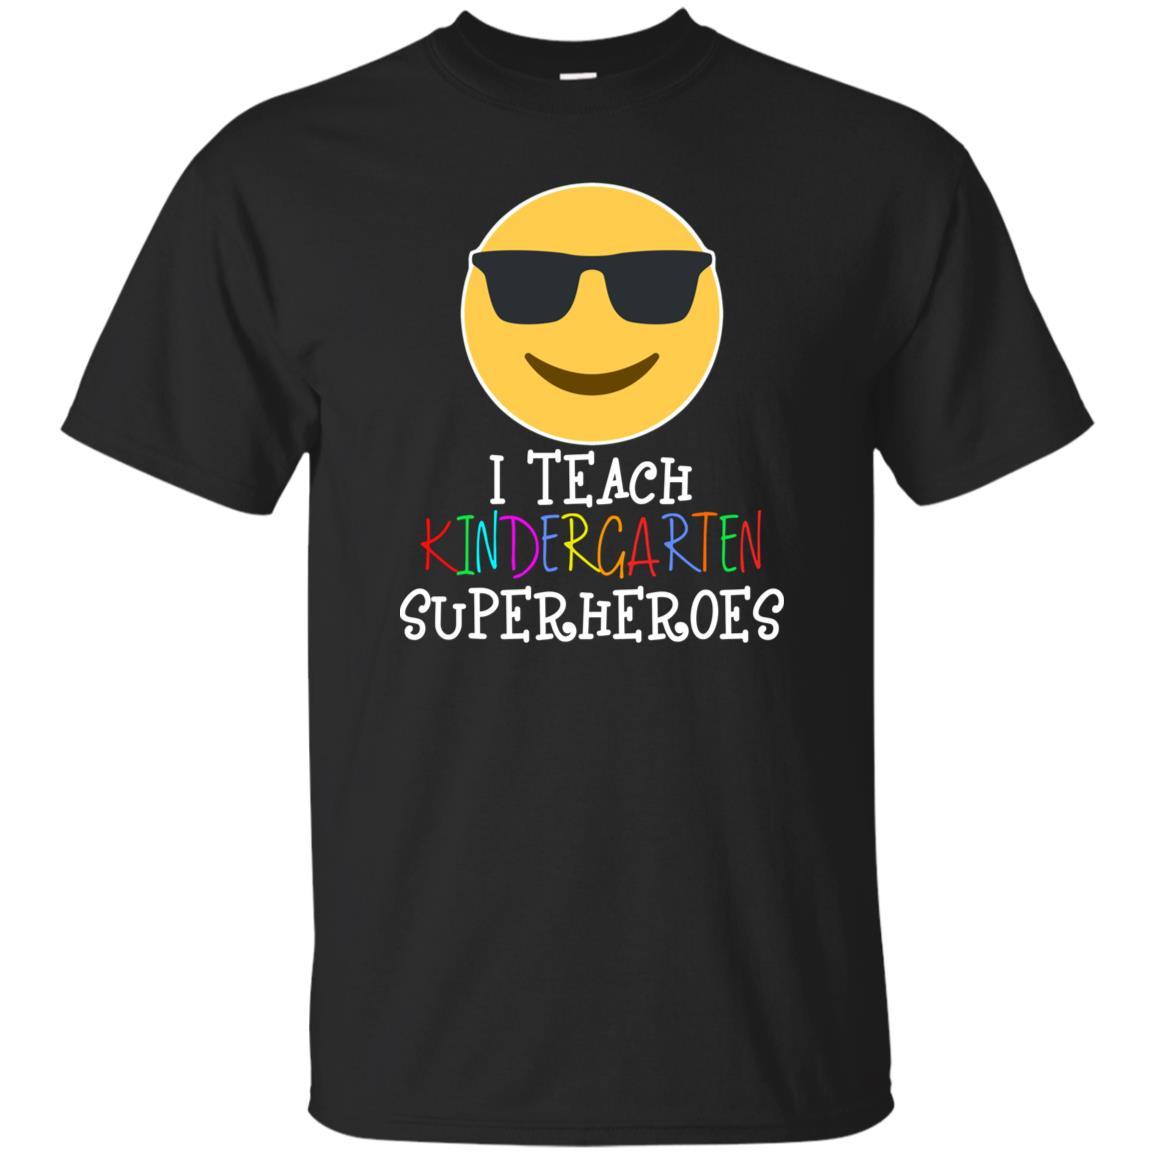 Funny Teacher Emoji I Teach Kindergarten Superheroes-1 Unisex Short Sleeve